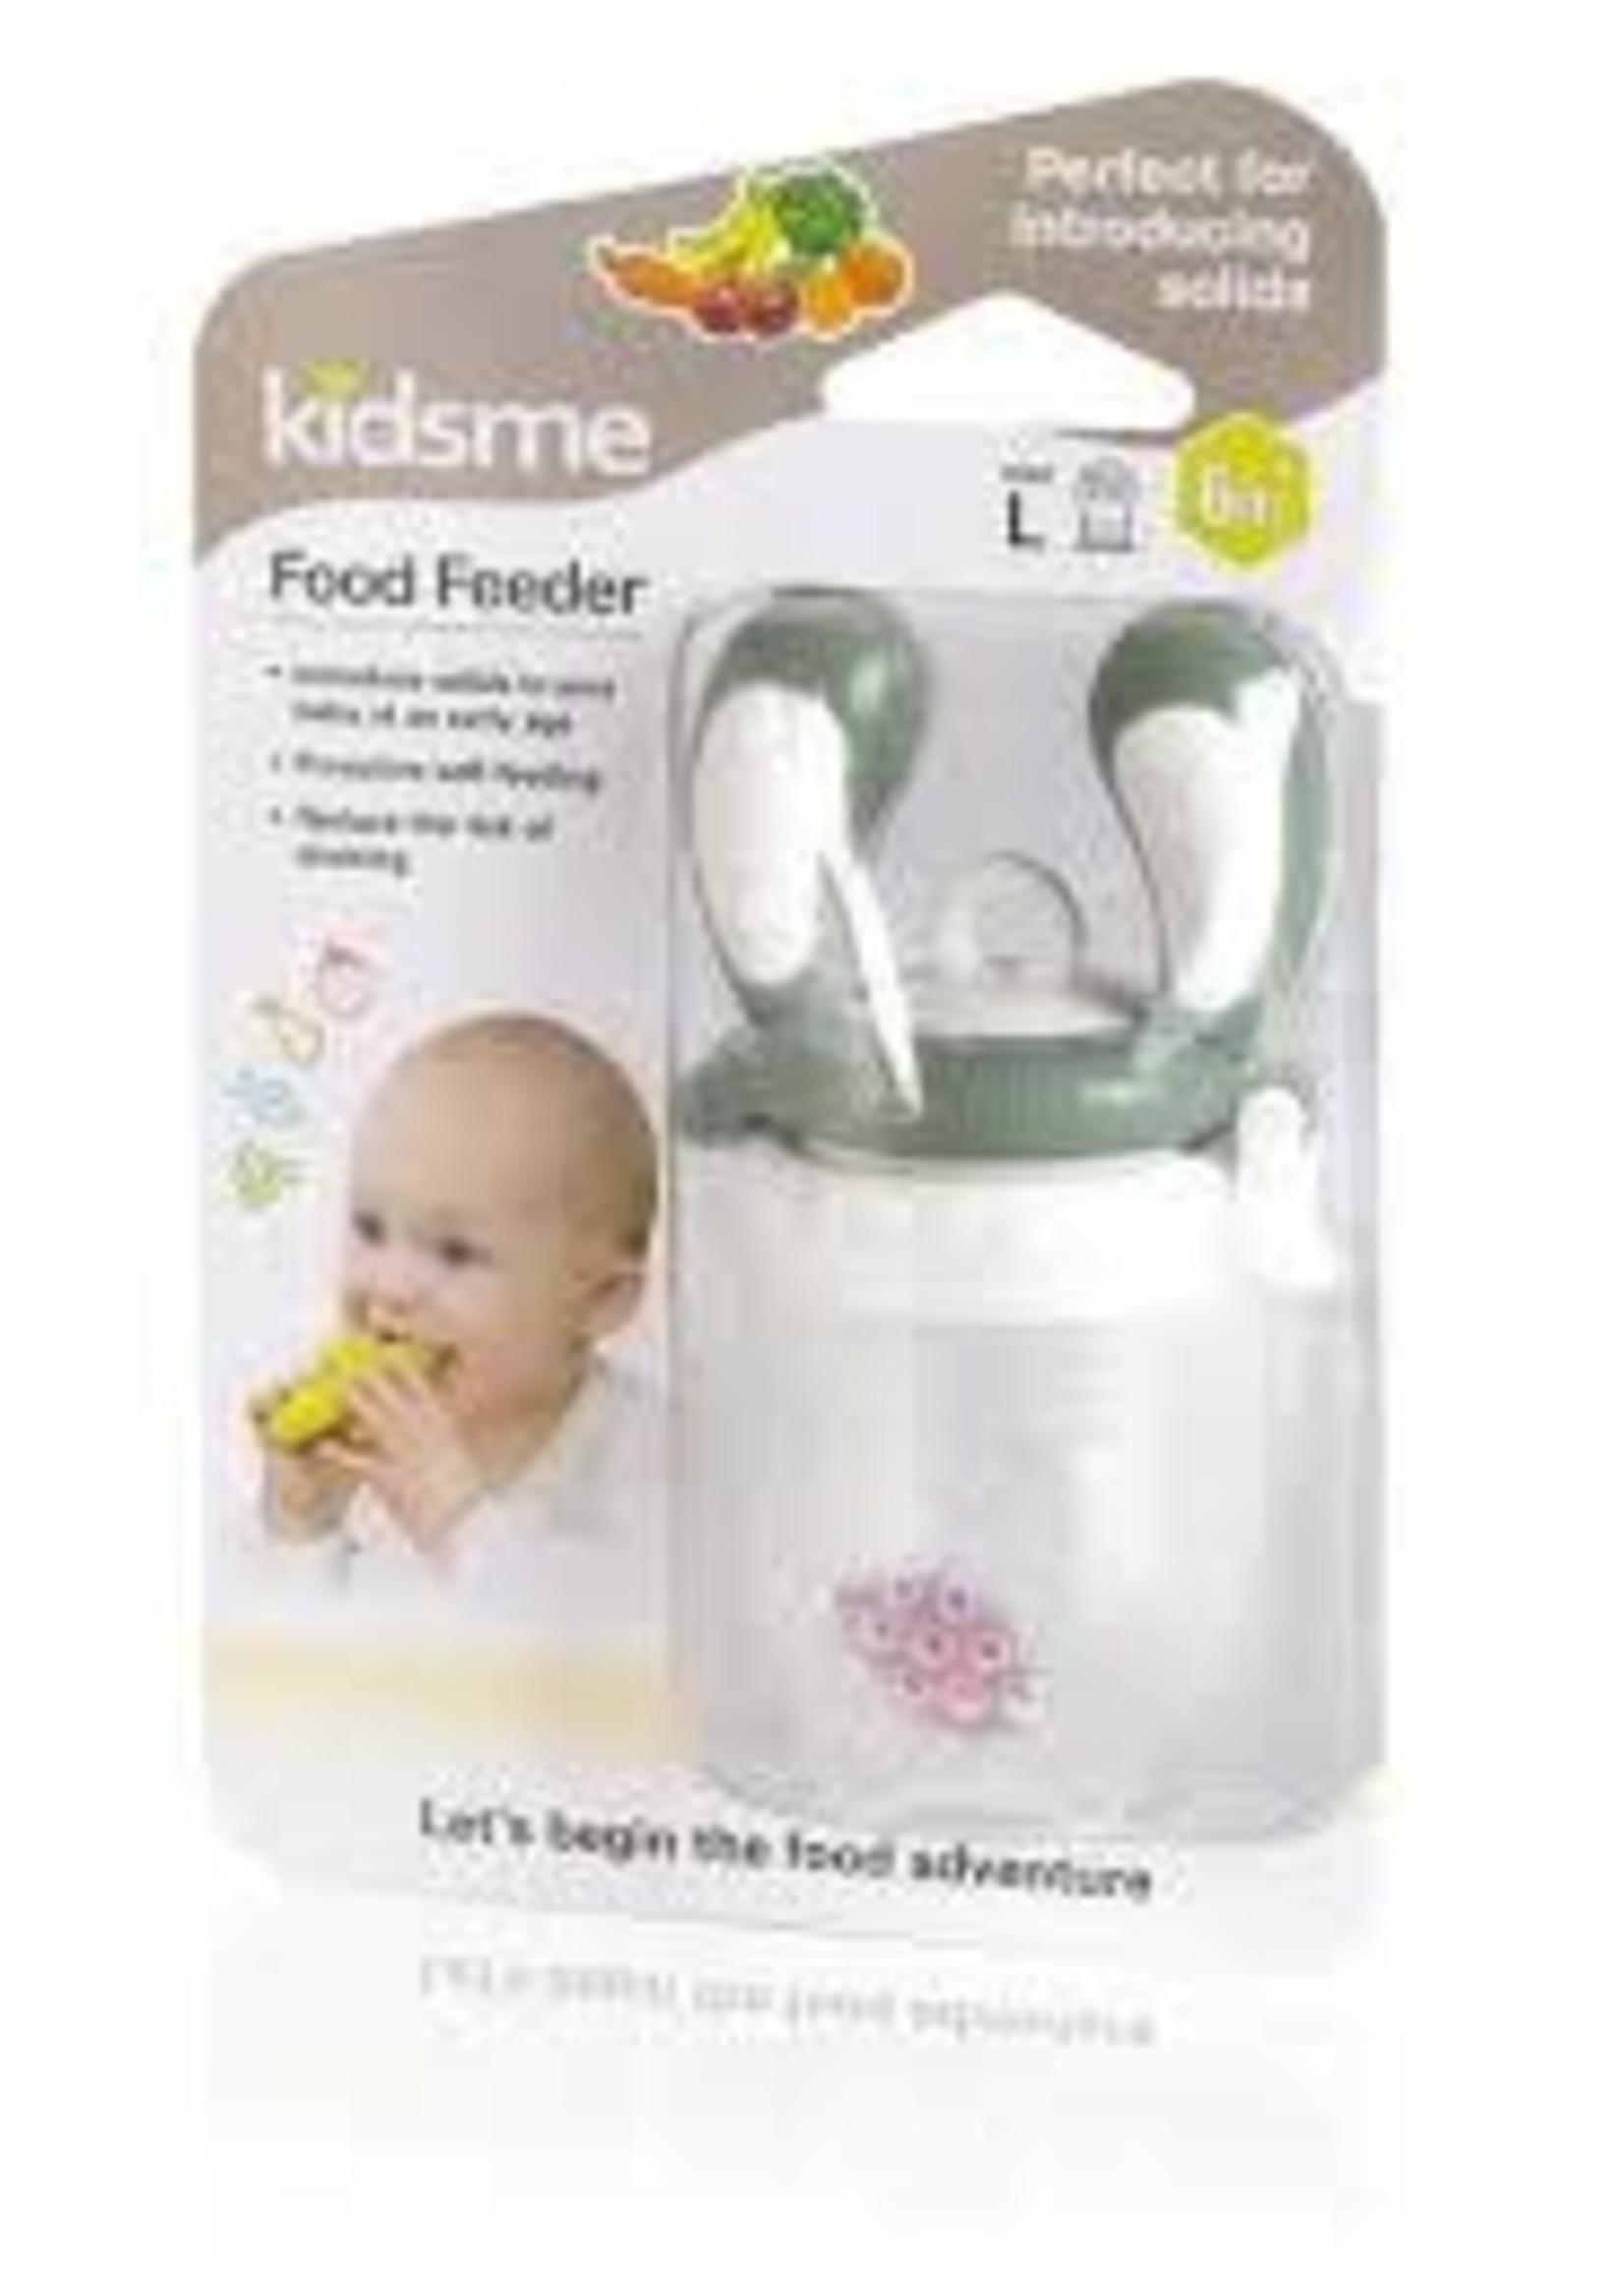 kidsme Kidsme Food Feeder